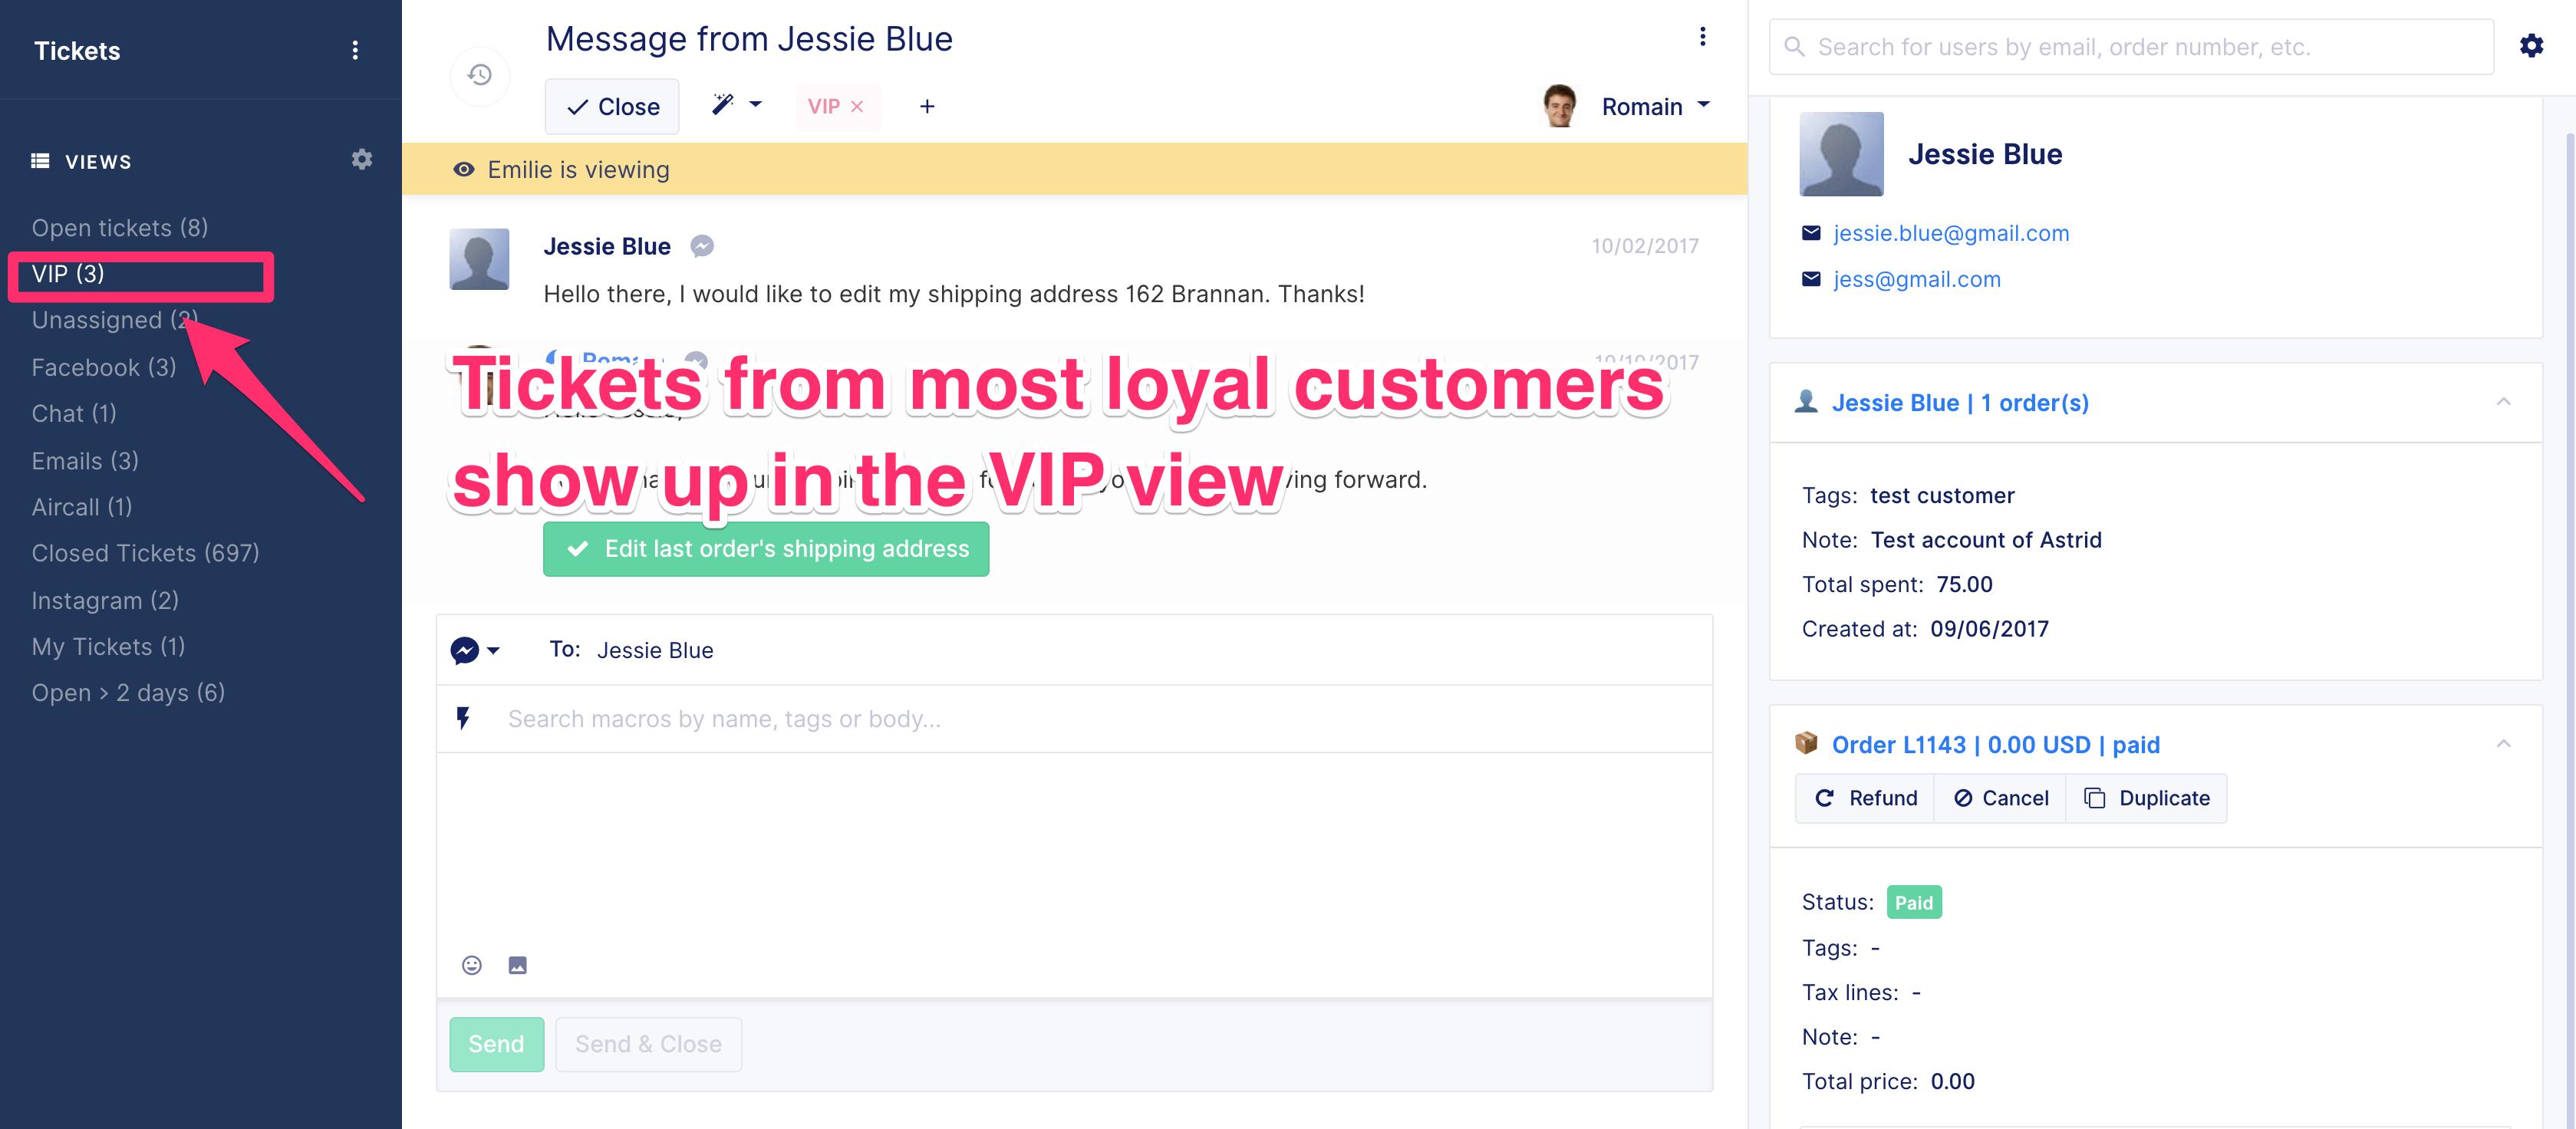 Message_from_Jessie_Blue